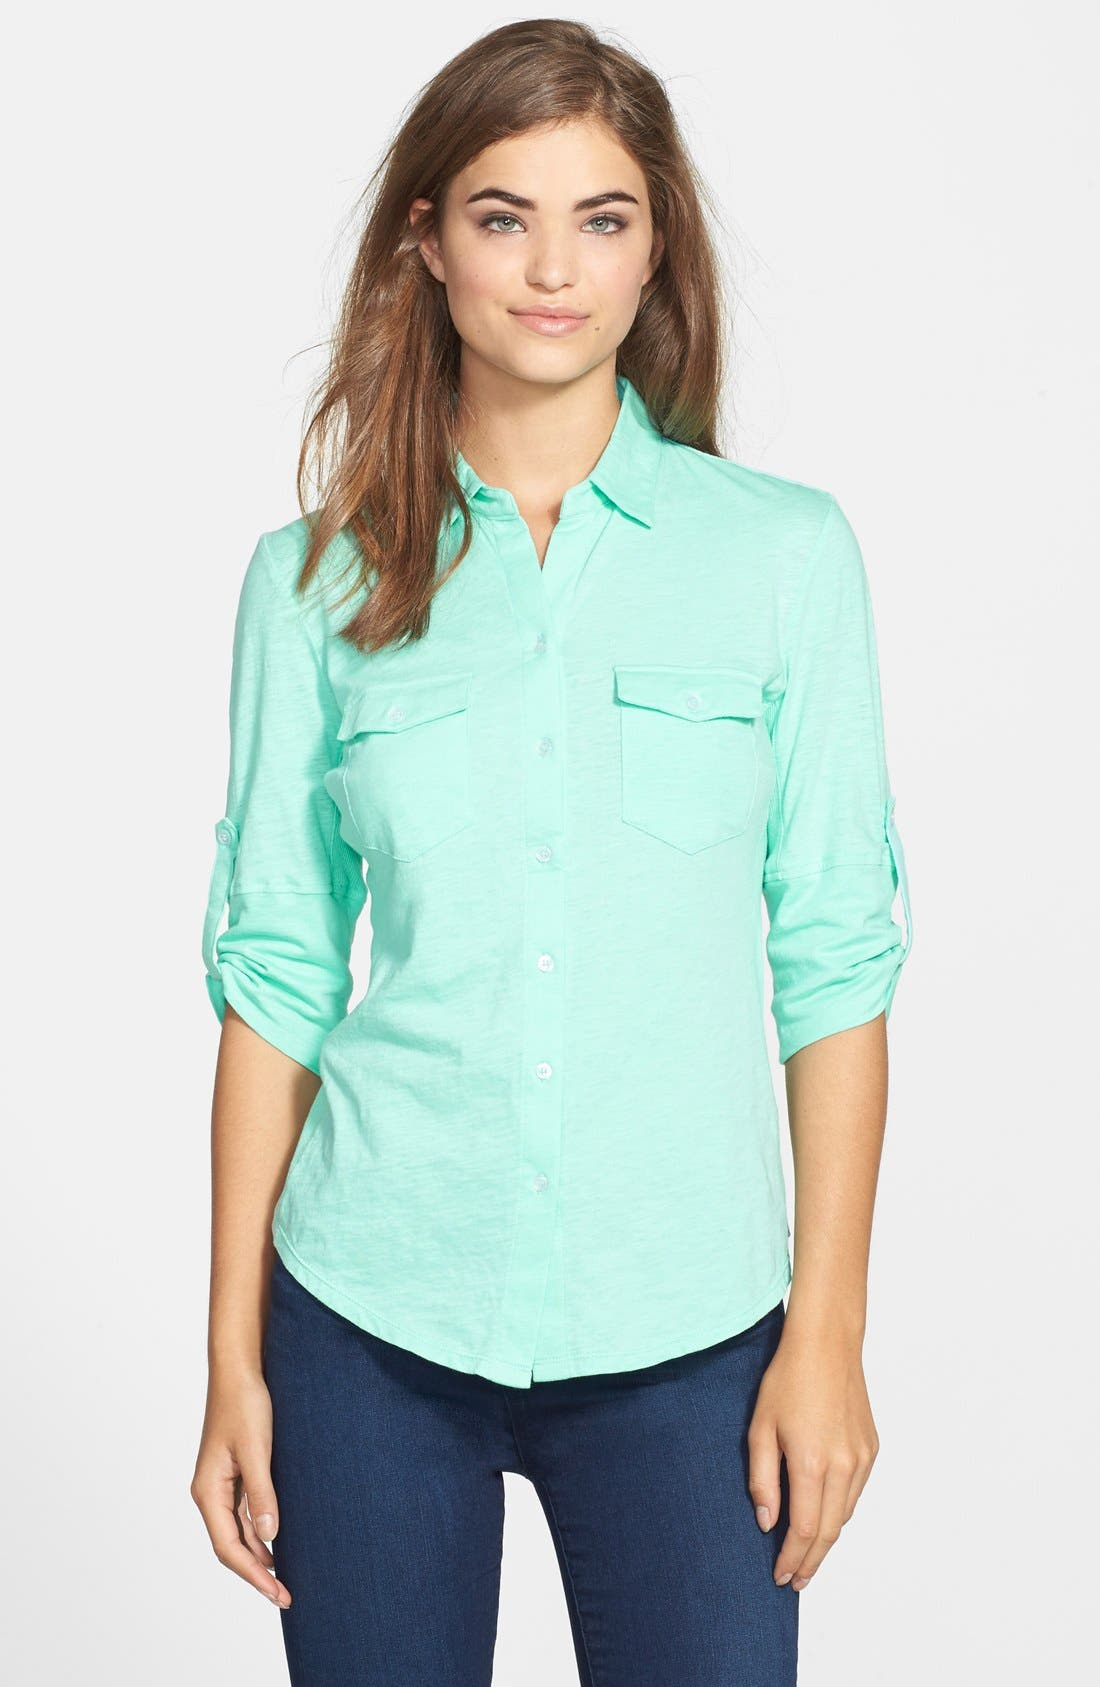 Main Image - Sandra Three Quarter Roll Sleeve Knit Shirt